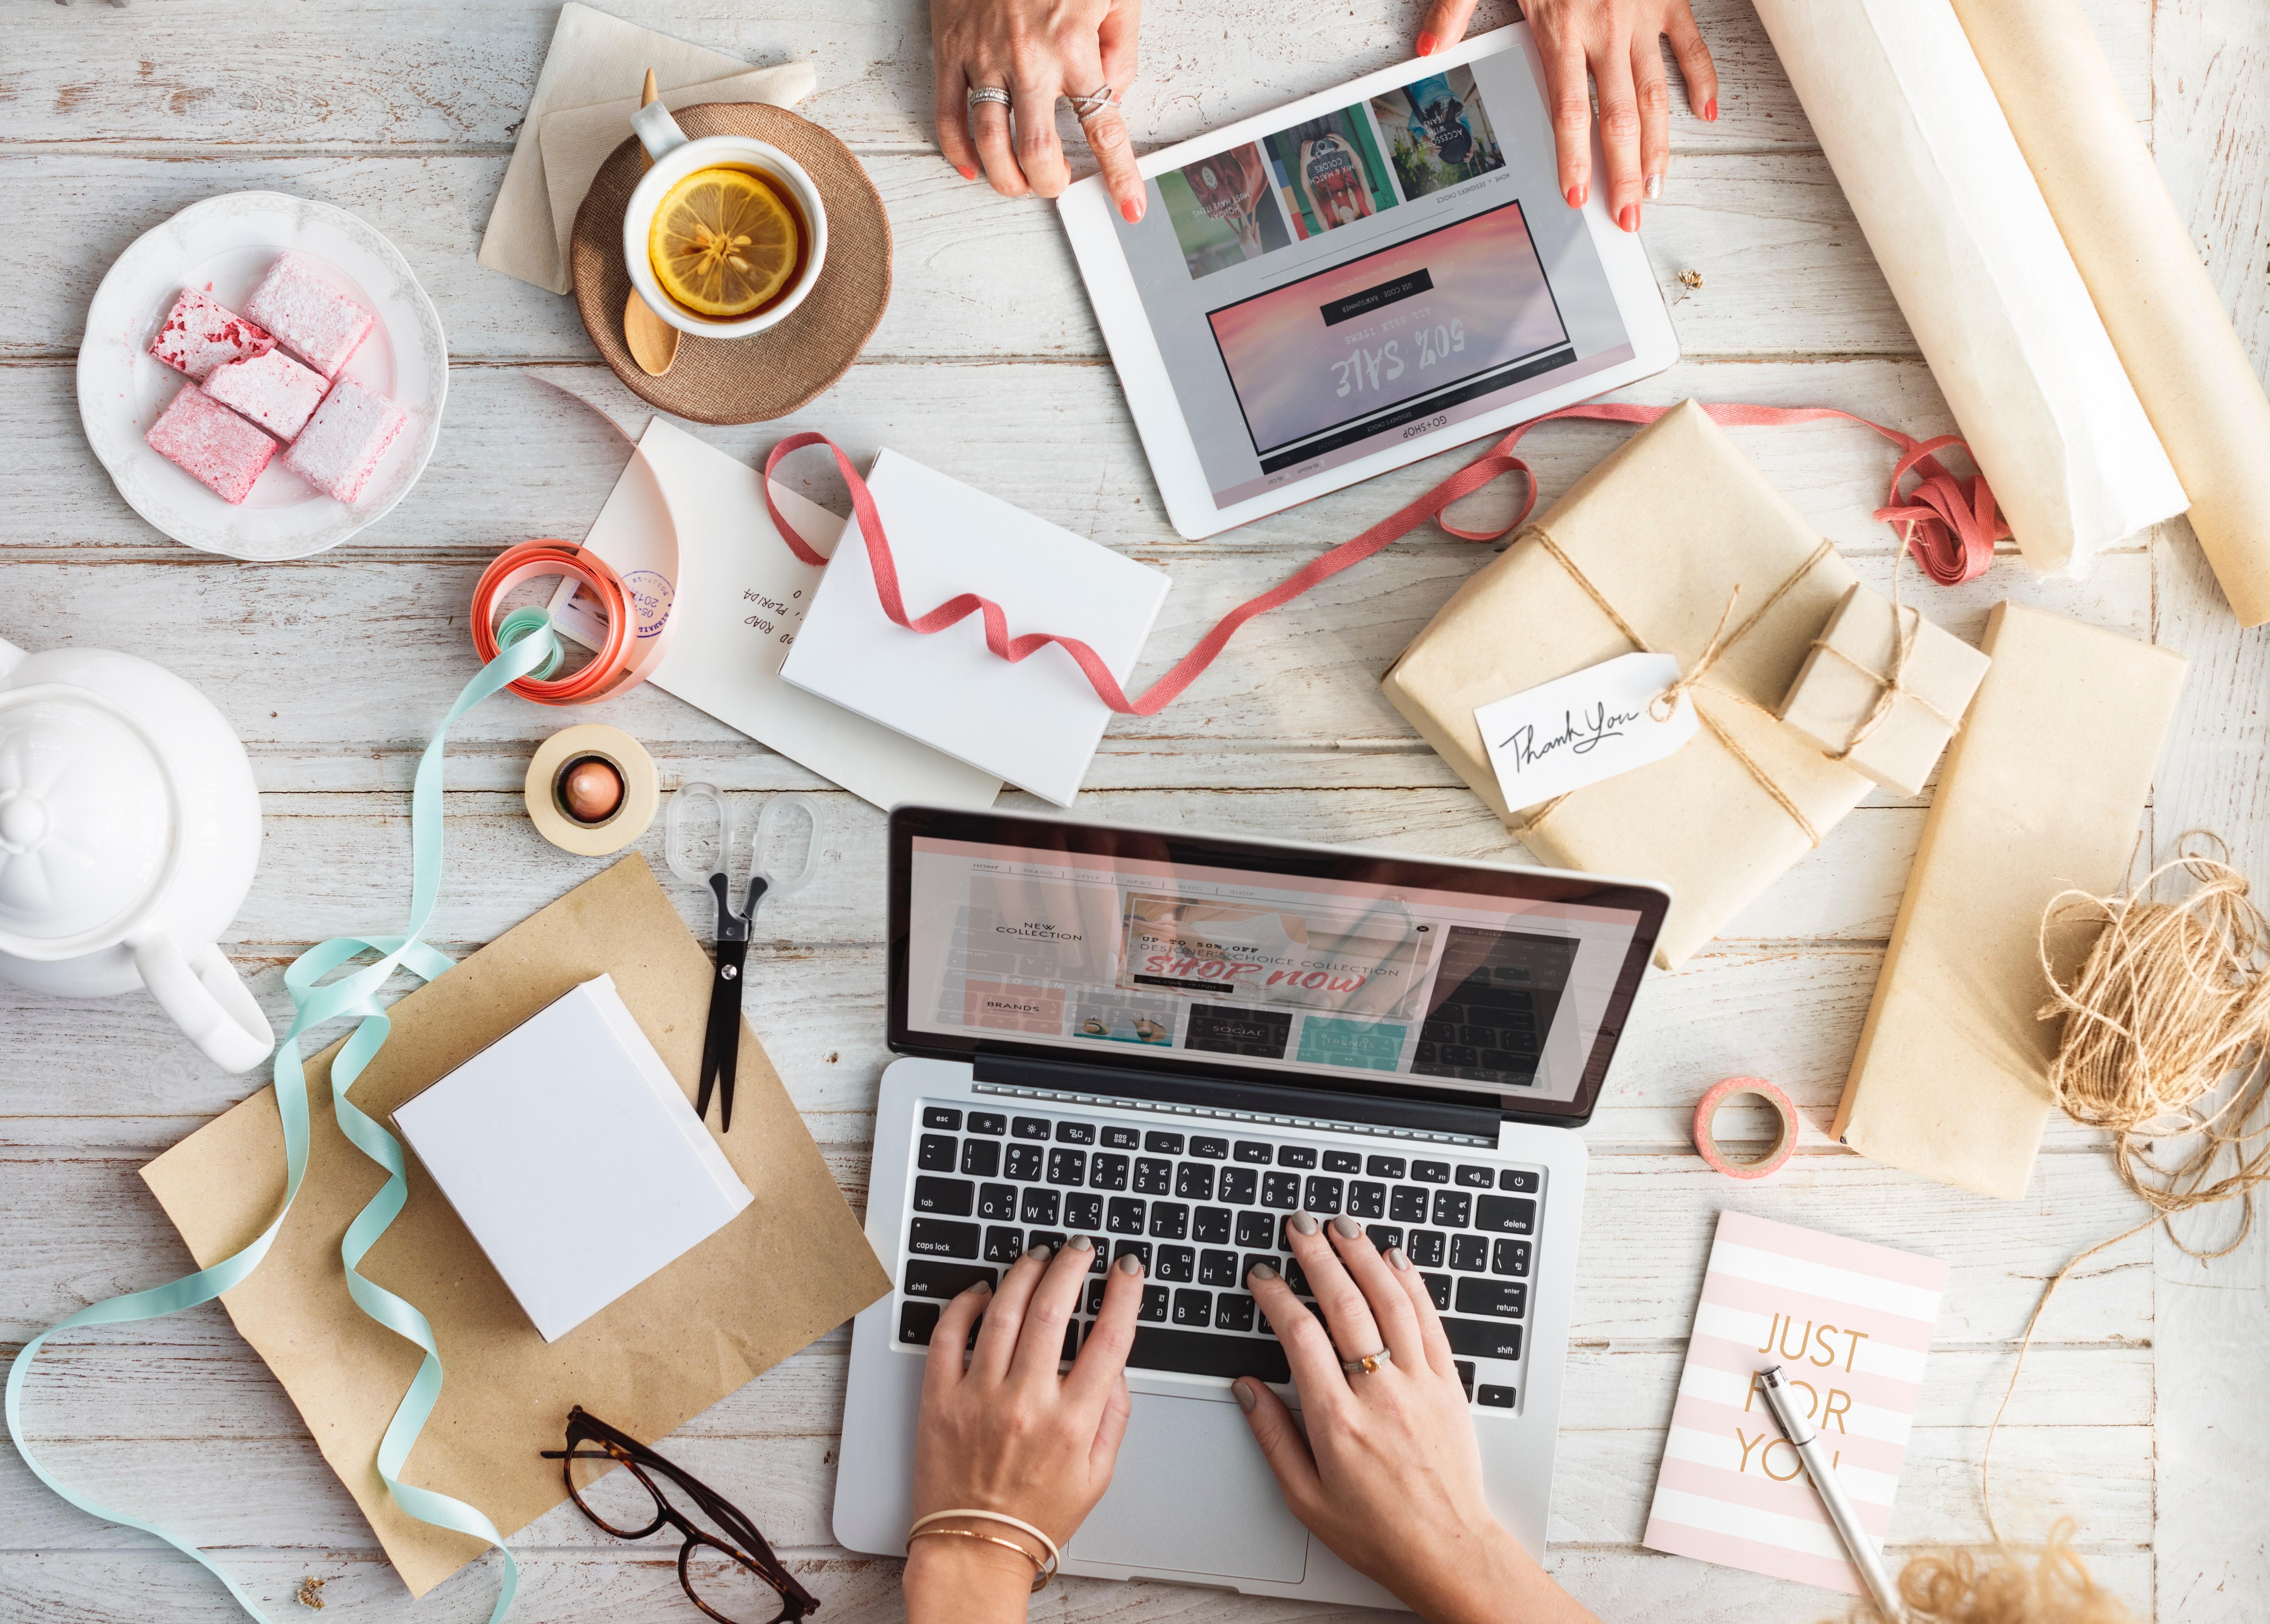 Happier by Design: Unstick your career in 2018